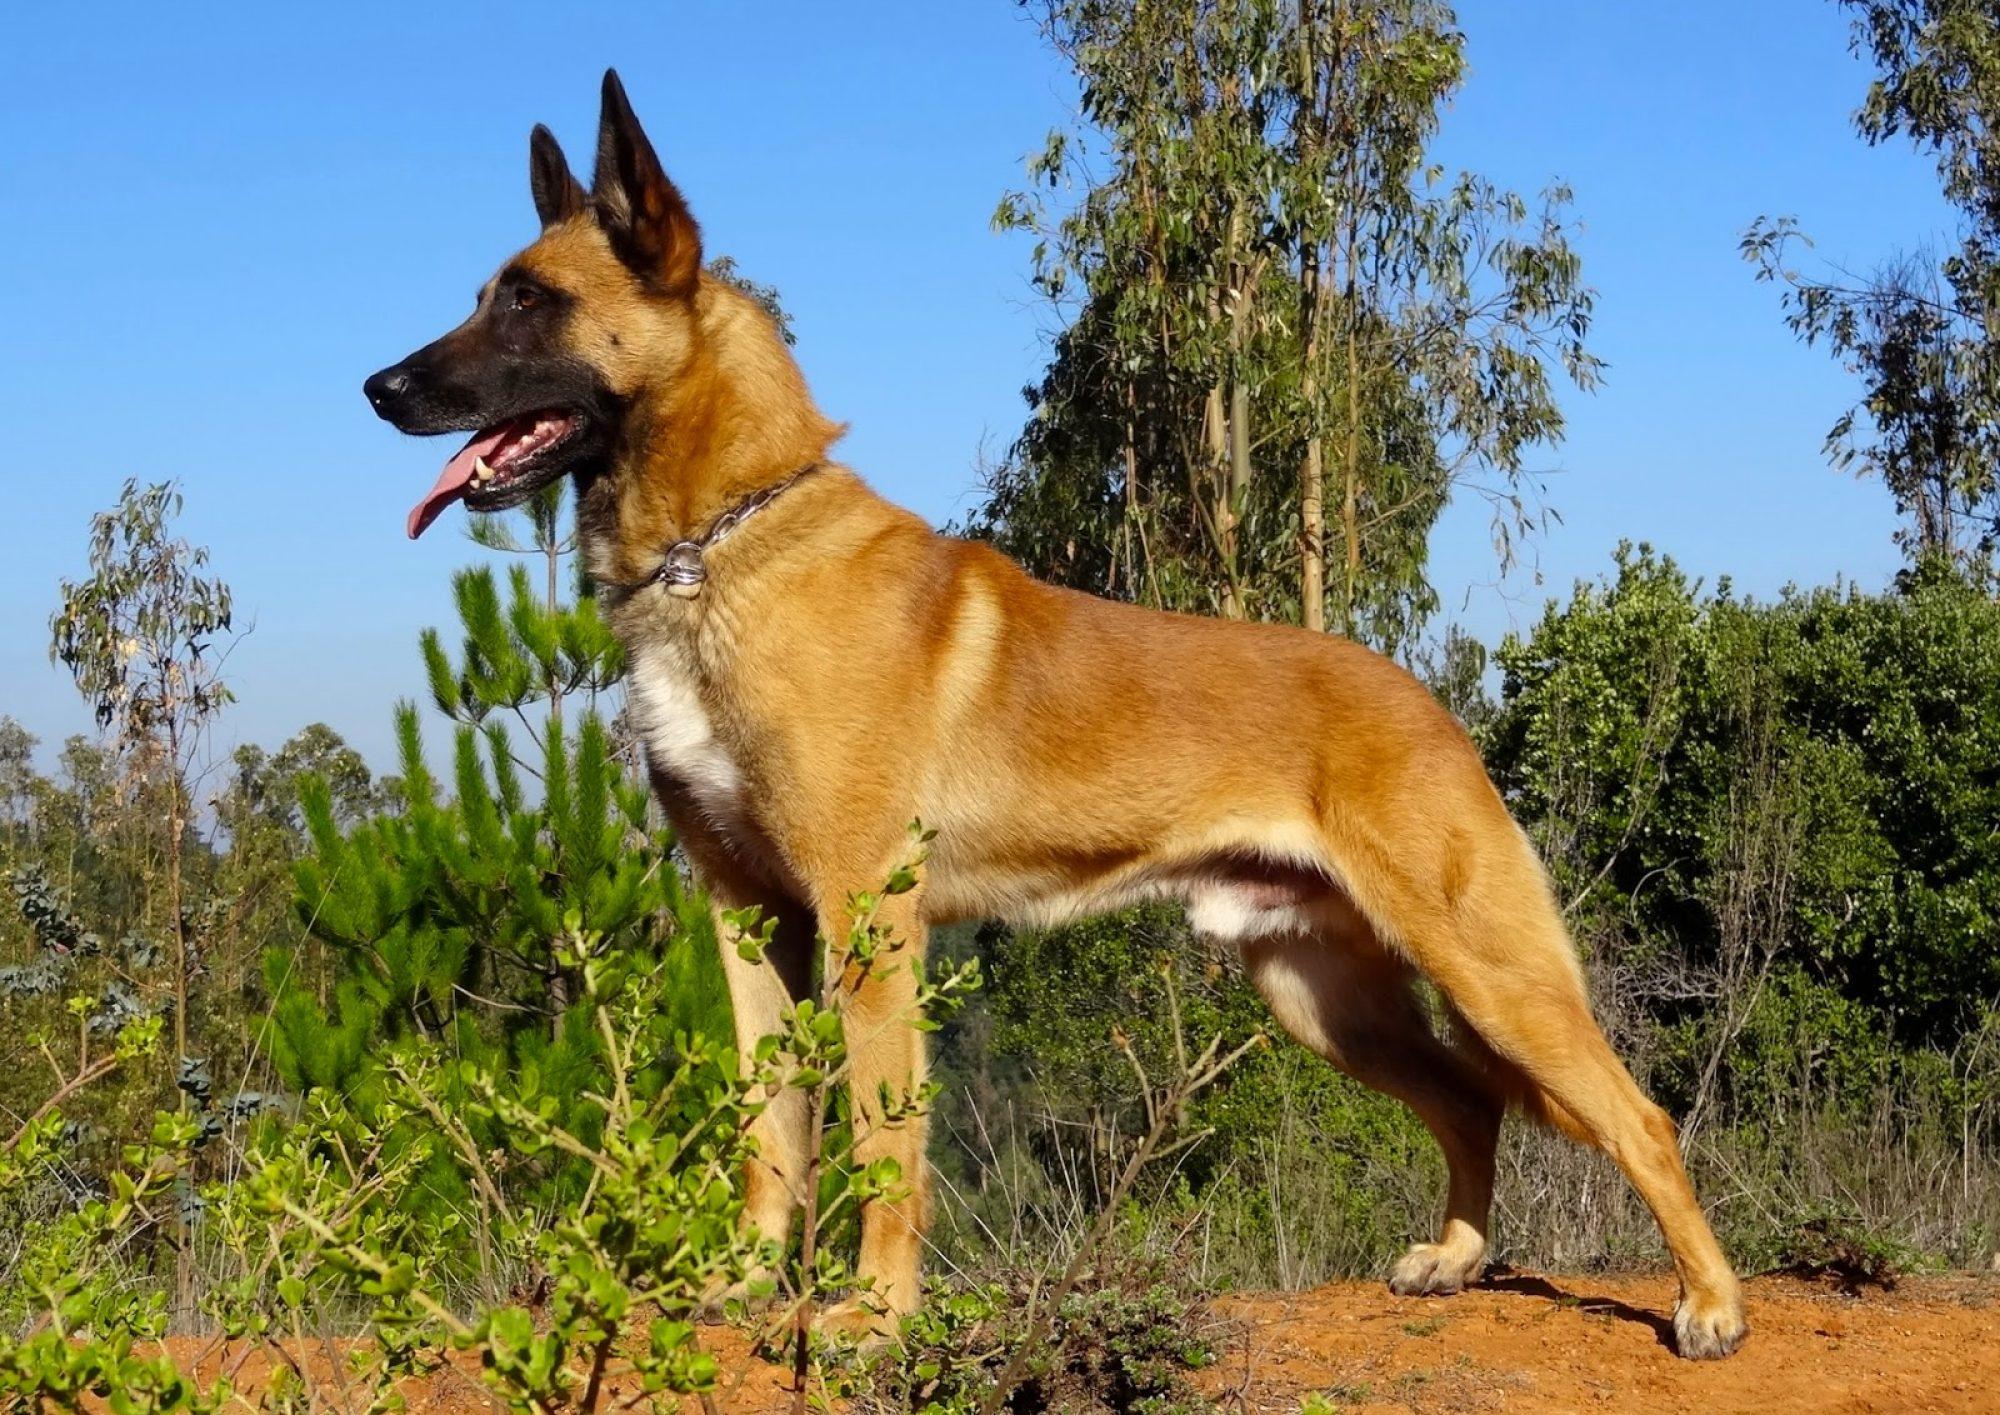 El Caliu Adiestramiento Canino